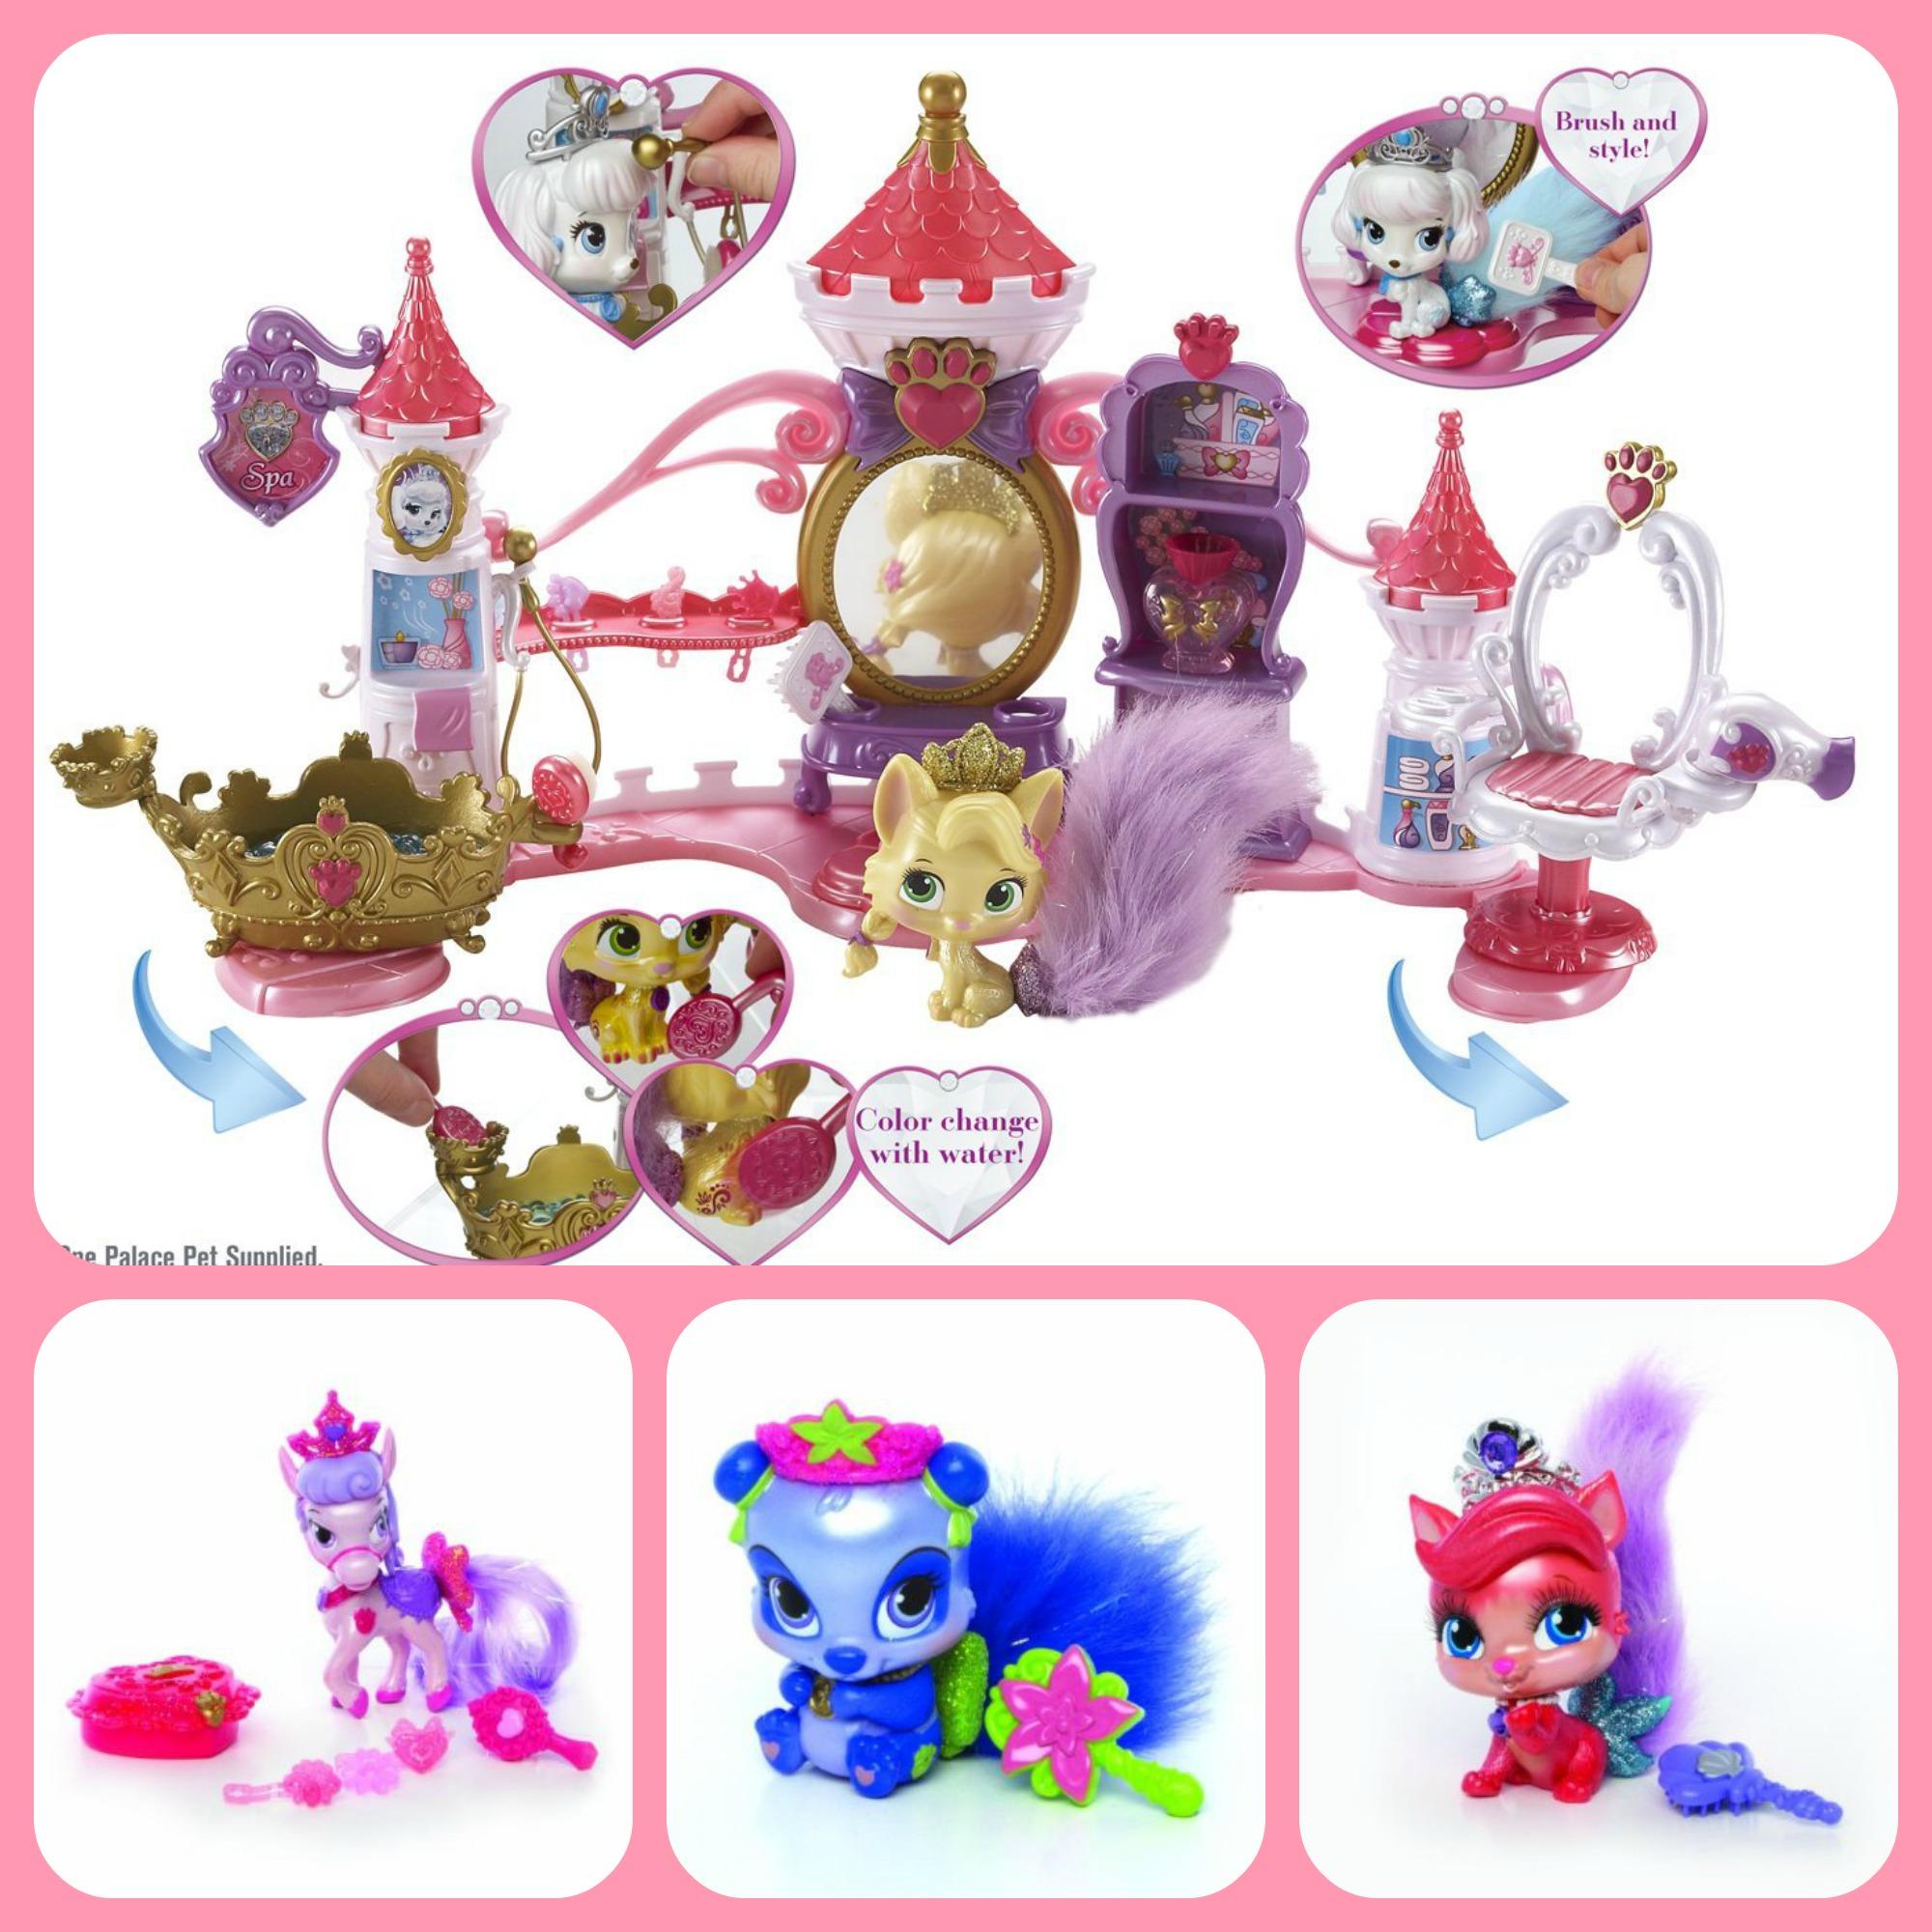 Disney Princess Palace Pets Review - Mumu0026#39;s the Word